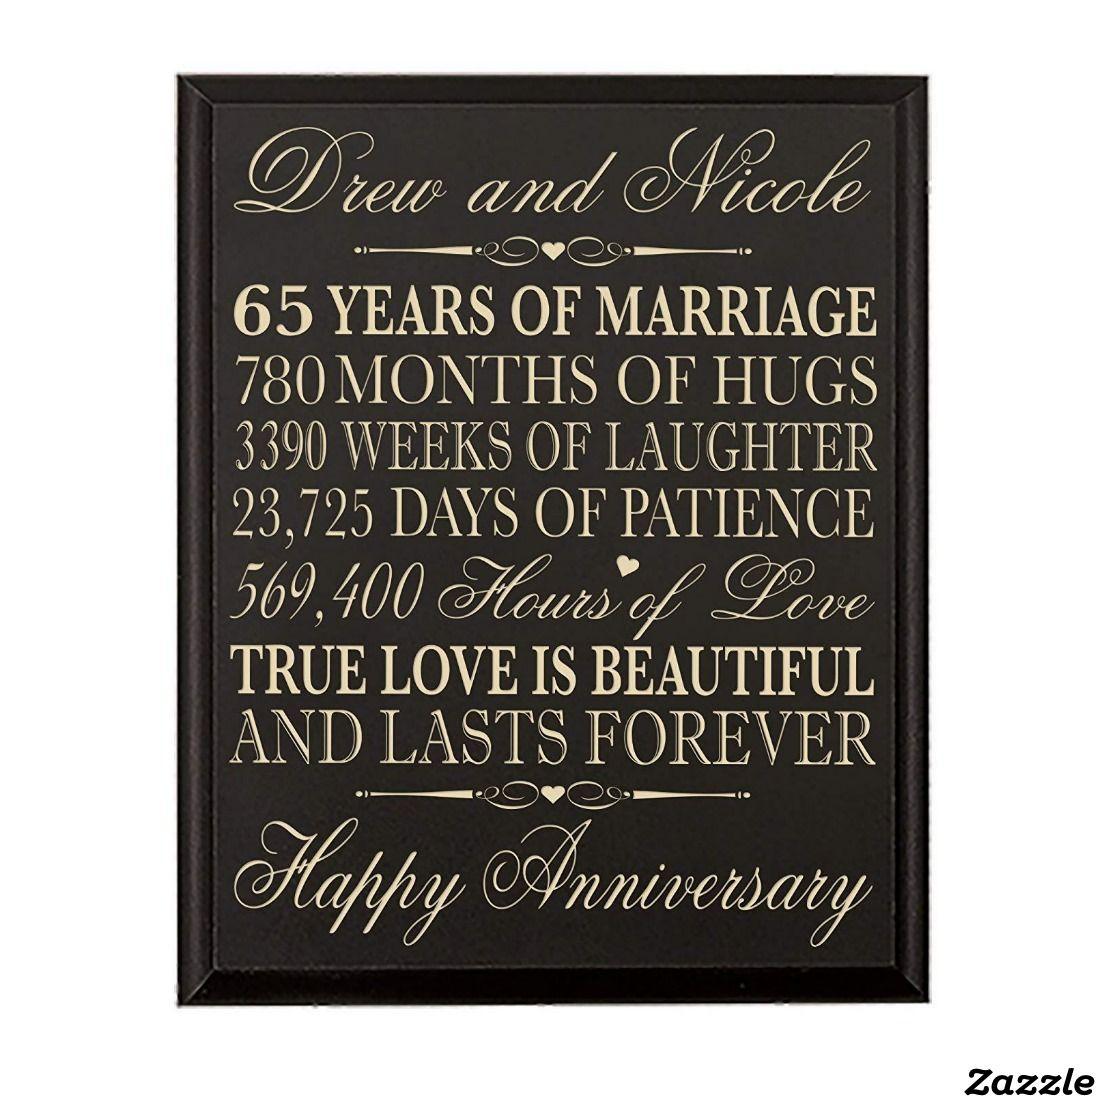 True Love 65th Anniversary Black Wooden Plaque Zazzle Com In 2021 45th Wedding Anniversary Gifts 60th Anniversary Gifts Anniversary Gifts For Parents